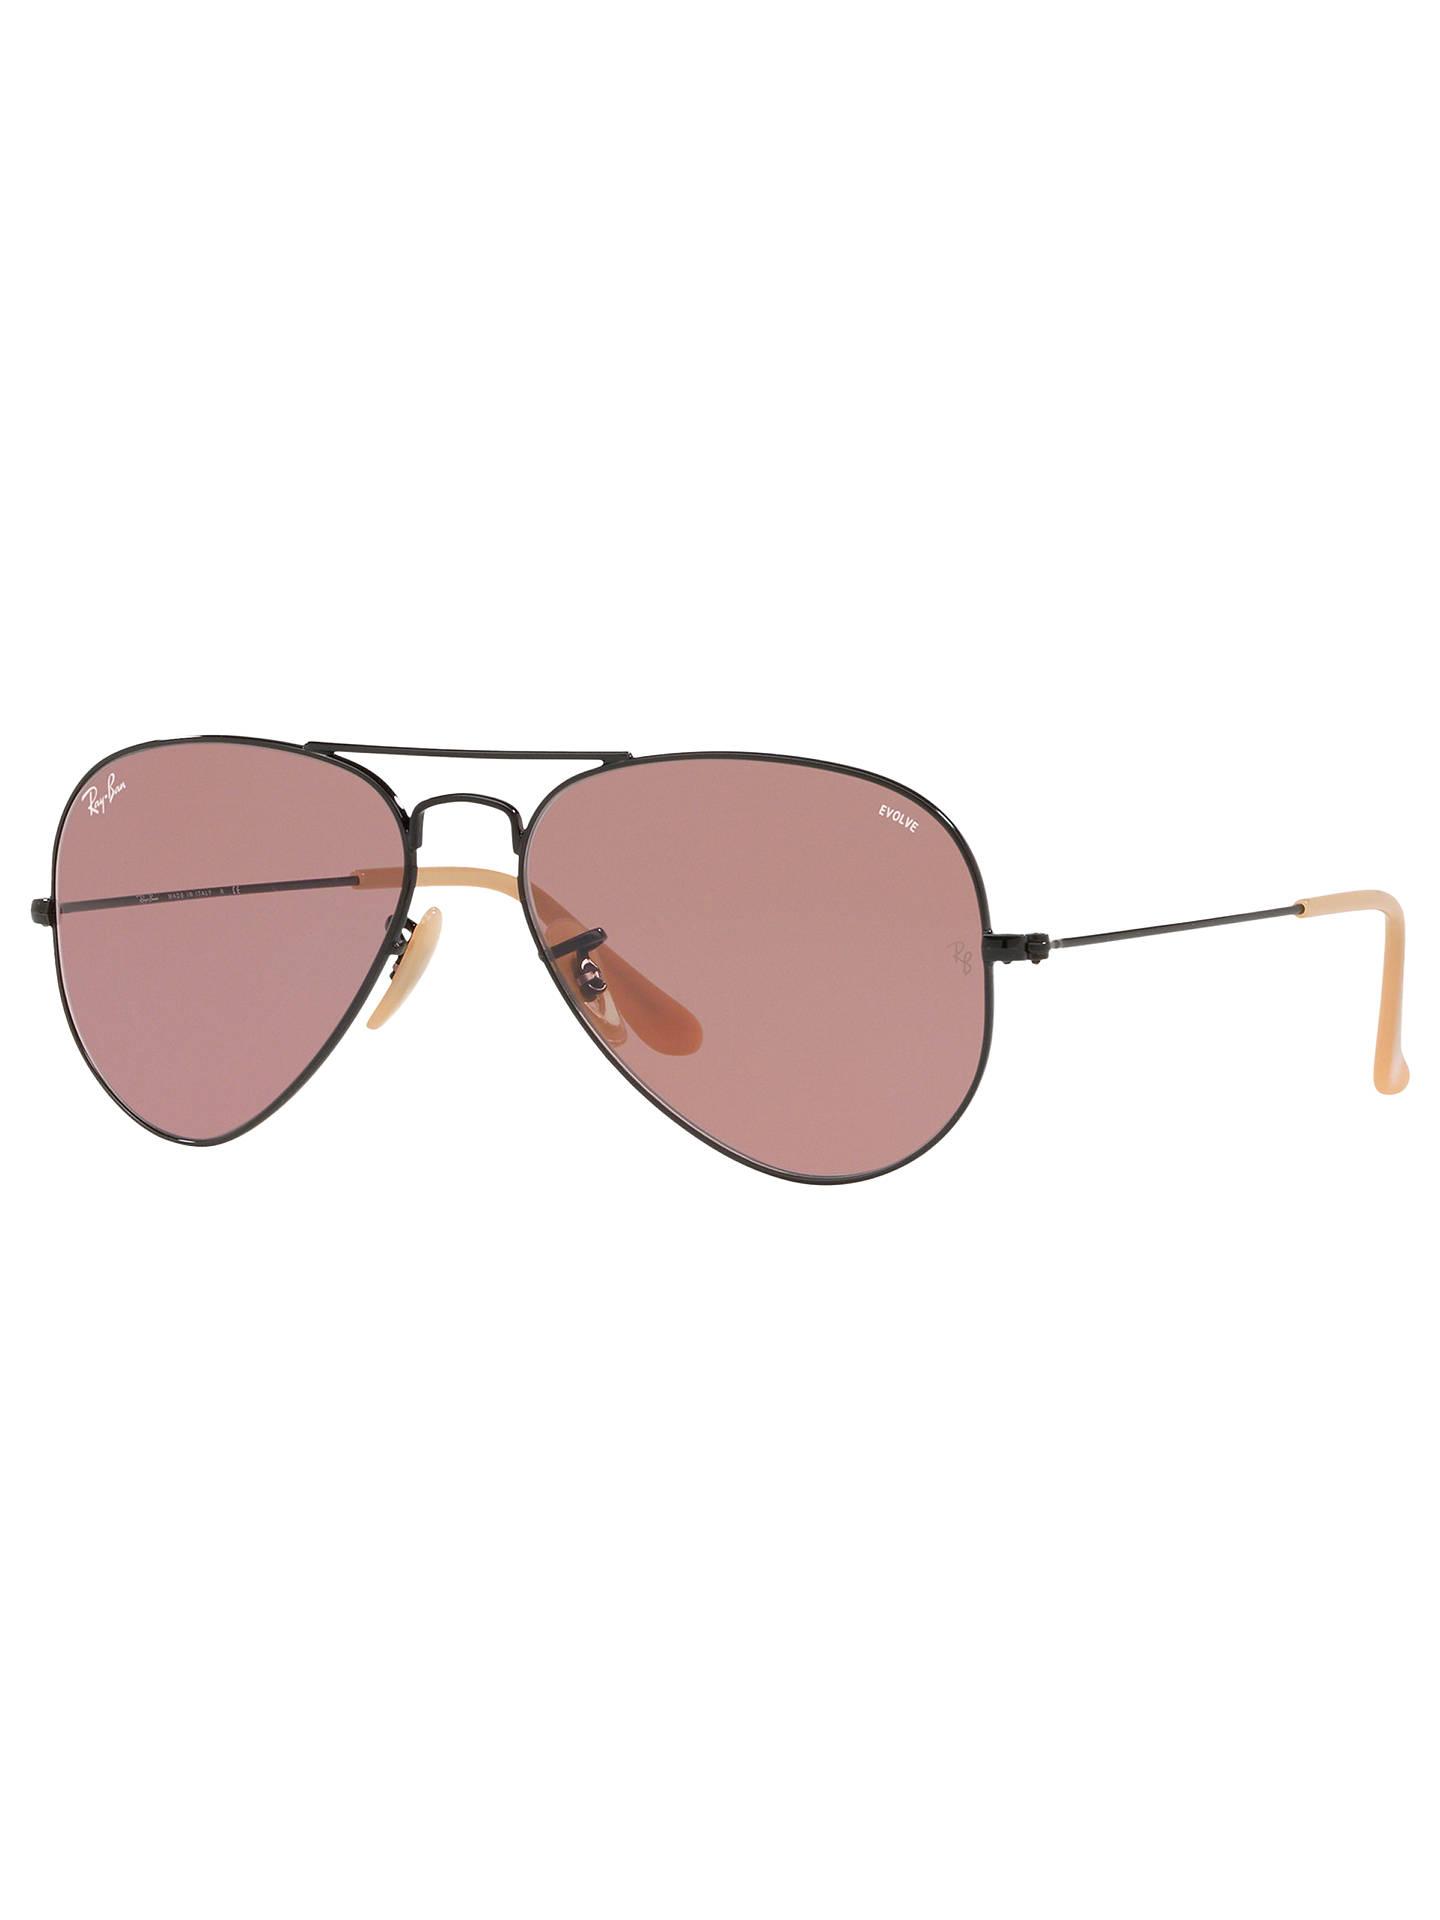 Ray-Ban RB3025 Men's Evolve Aviator Sunglasses, Black